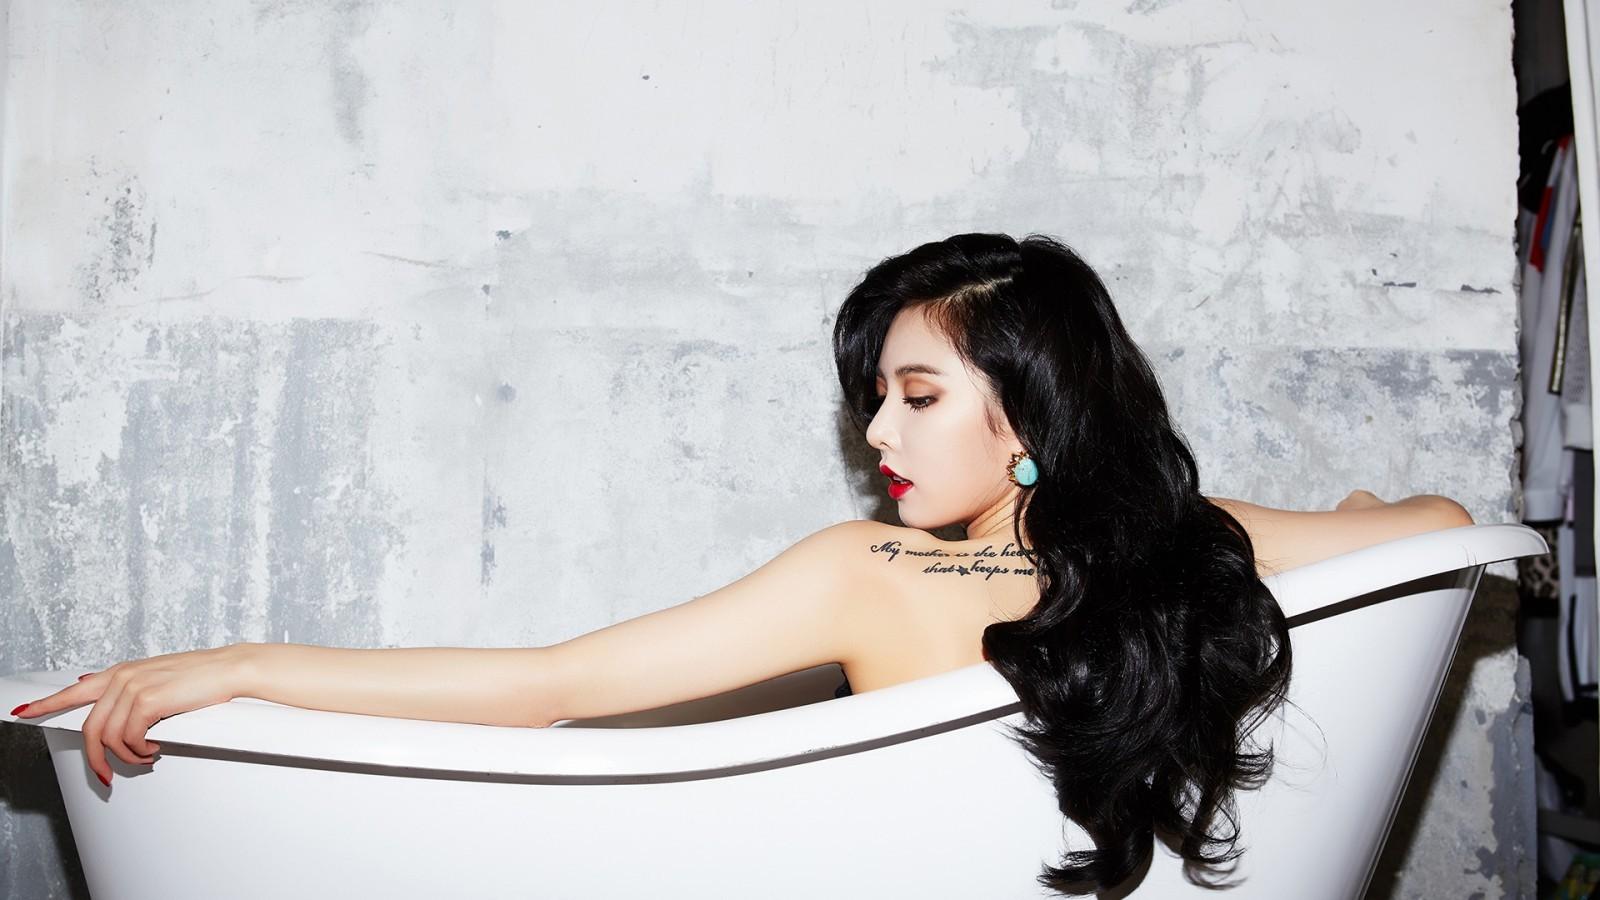 font b Asian b font Hyuna beauty beautiful sexy woman in bathtub black long font